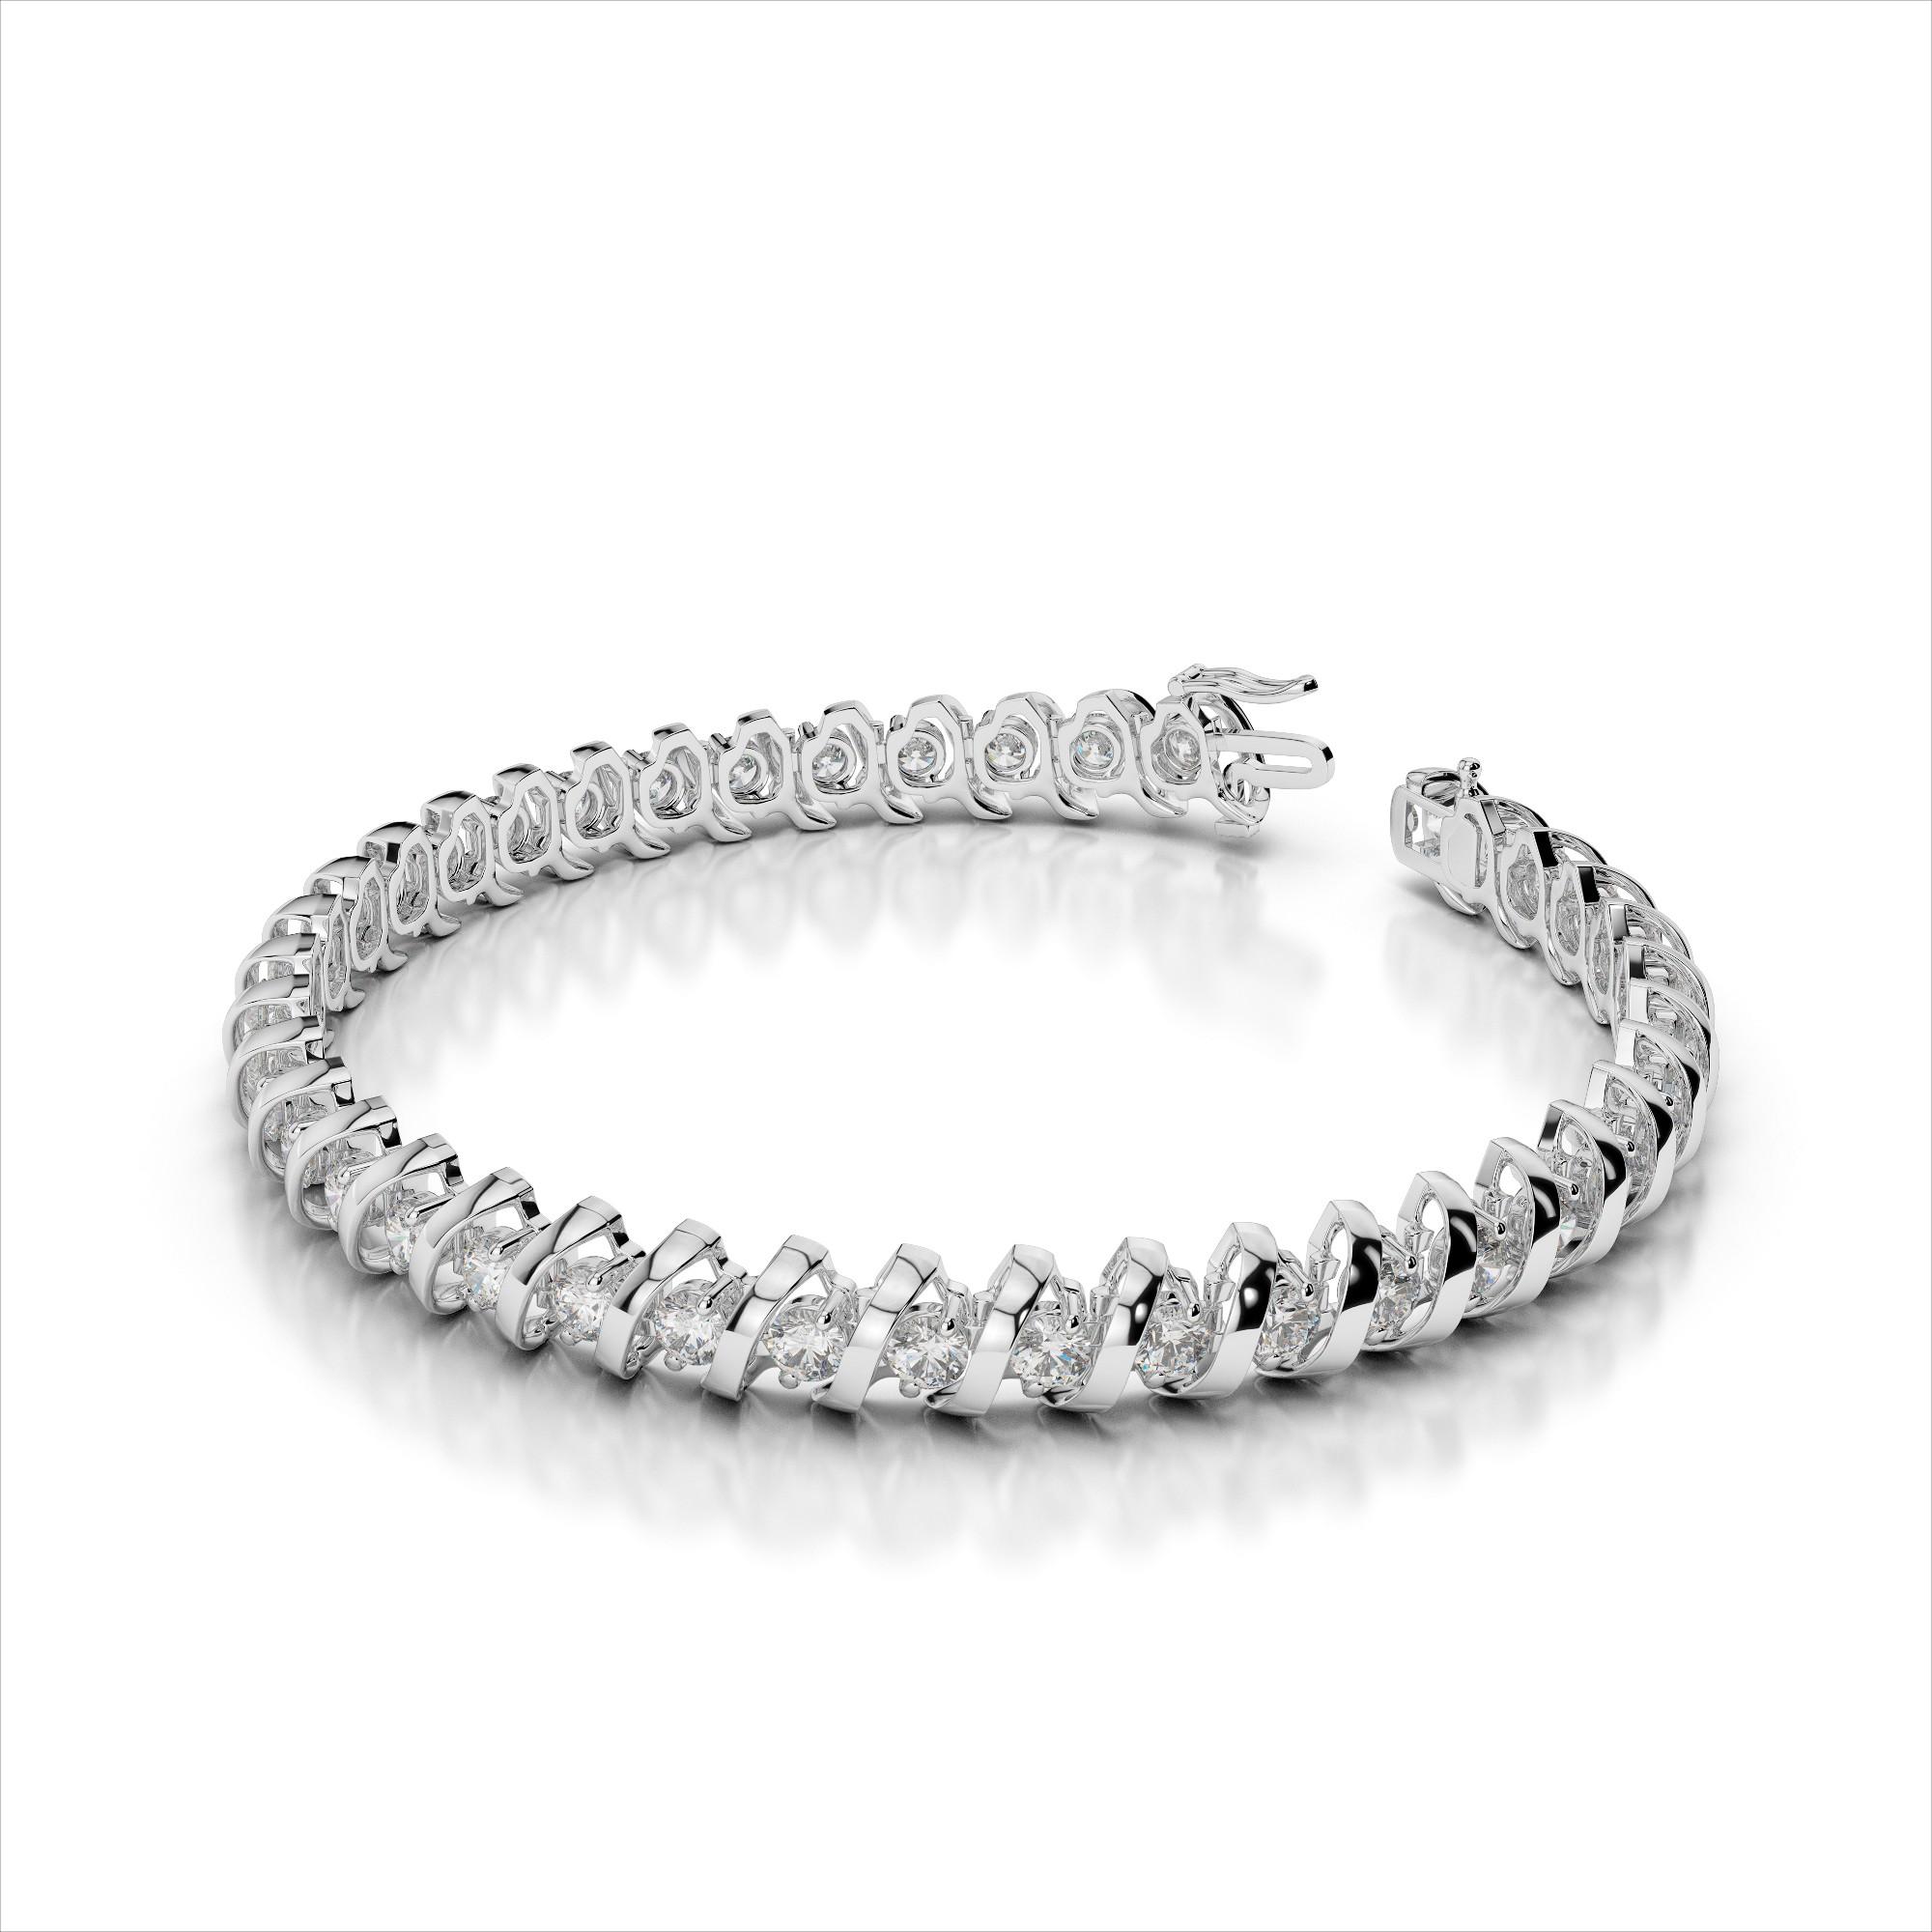 Diamond Bracelet with 'S' Link